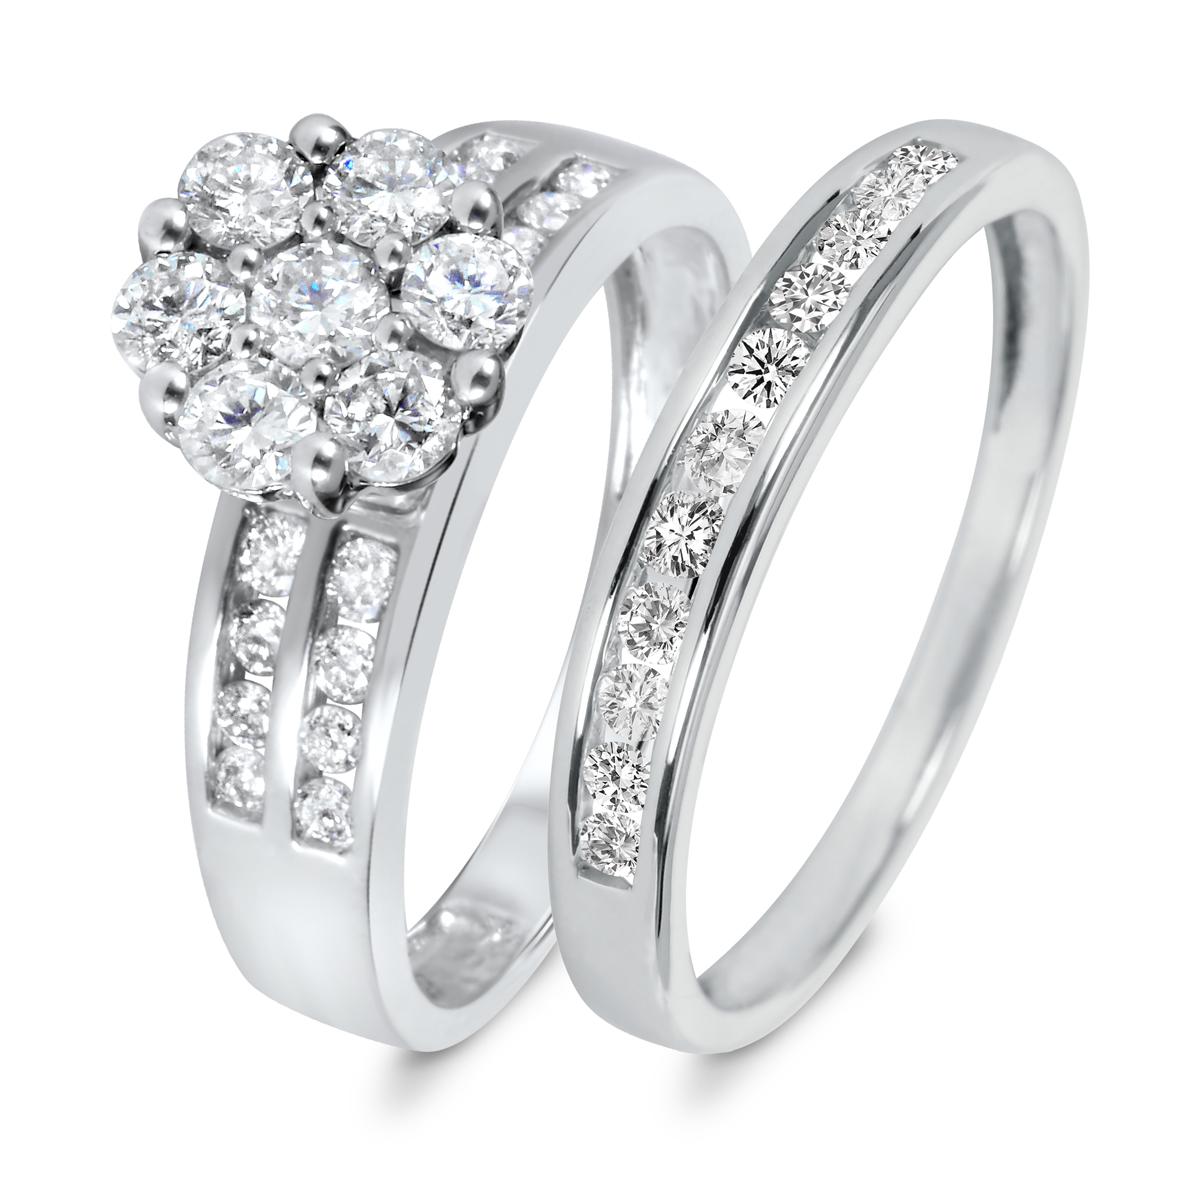 1 1/5 CT. T.W. Diamond Women's Bridal Wedding Ring Set 10K White Gold